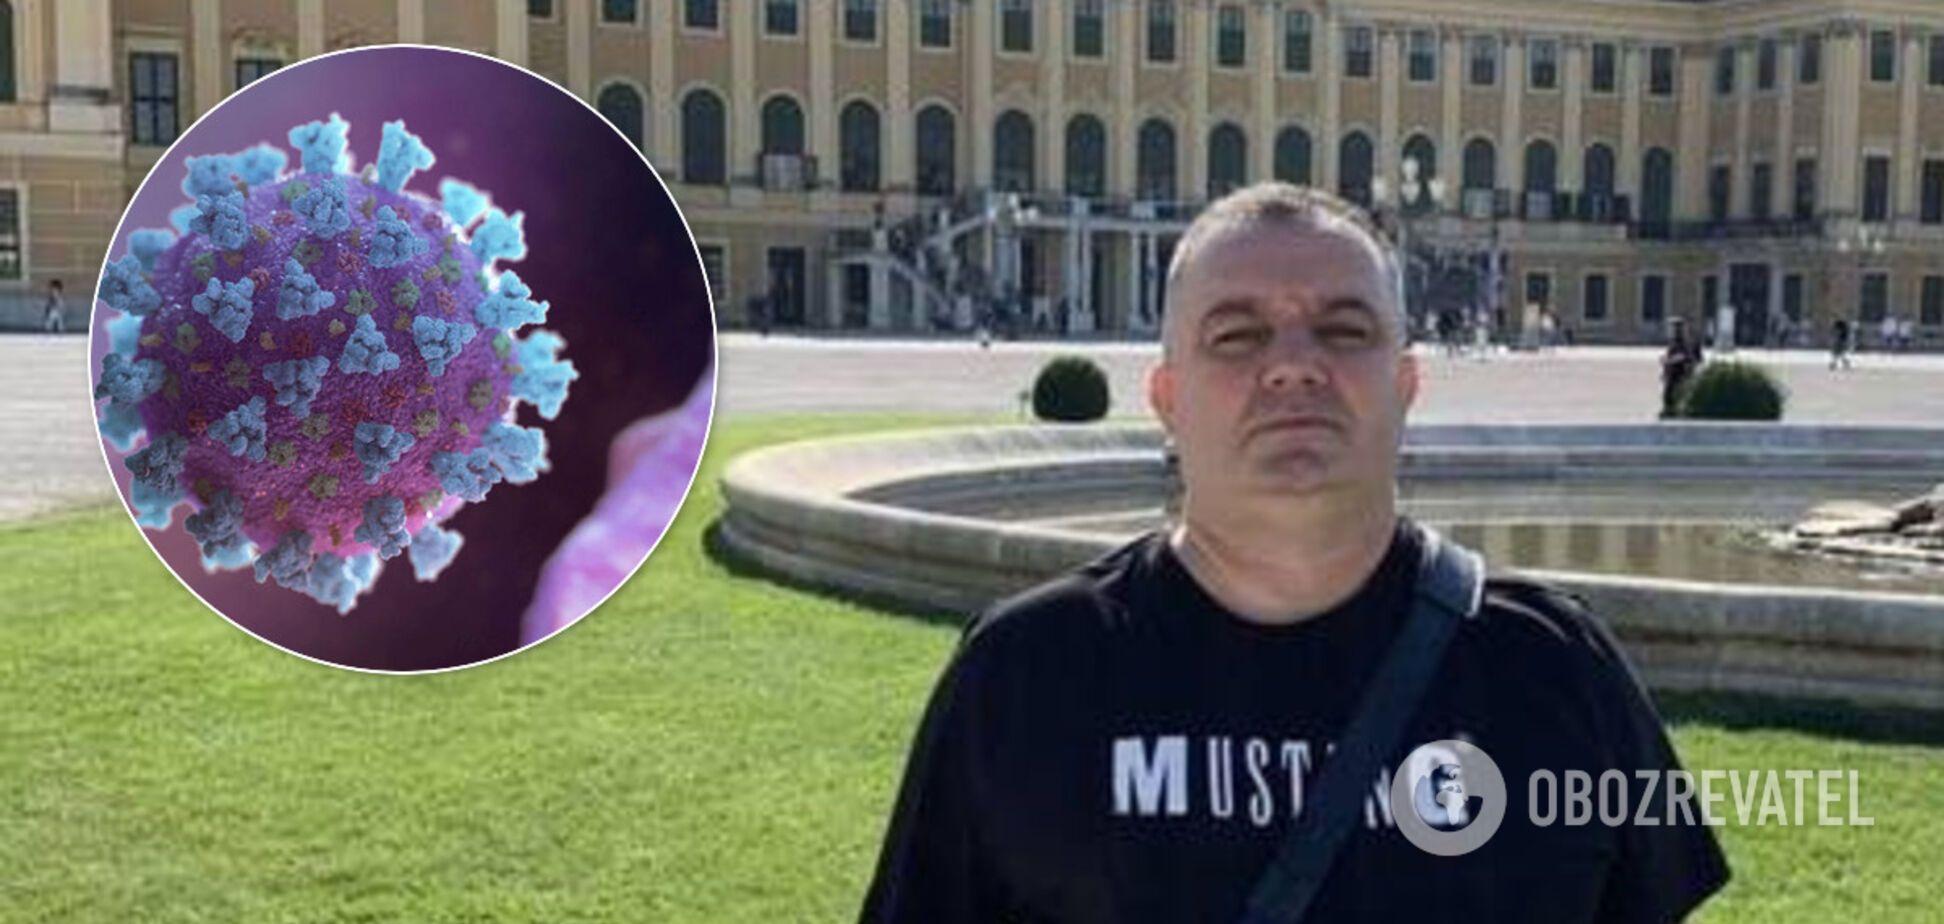 В Одессе пациент заплатил 25 тыс. грн за лечение от коронавируса